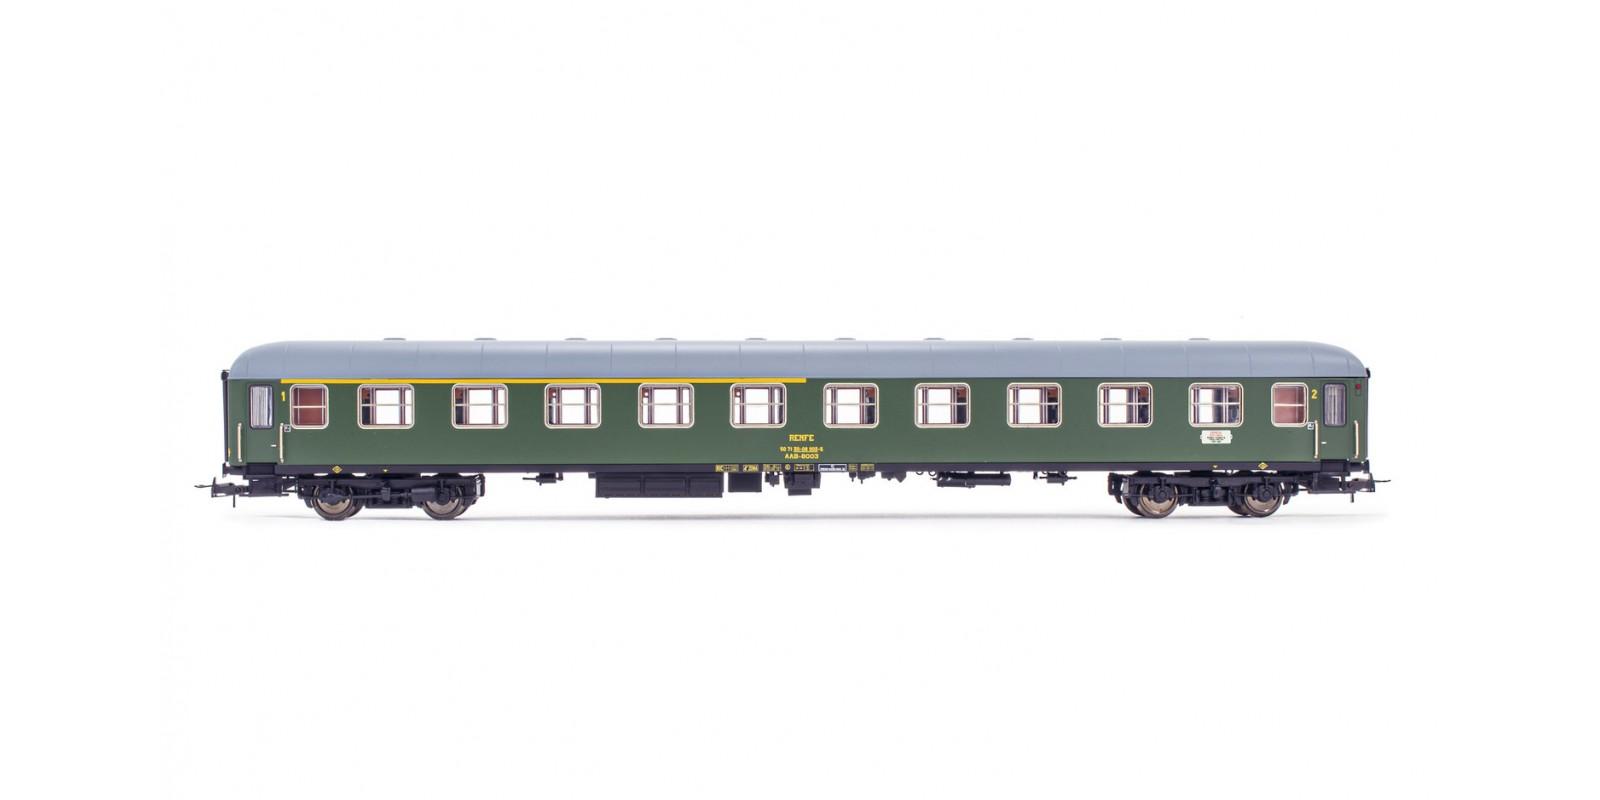 ET18037 RENFE, AAB-8000 1st/2nd class coach, green livery, ep. IV